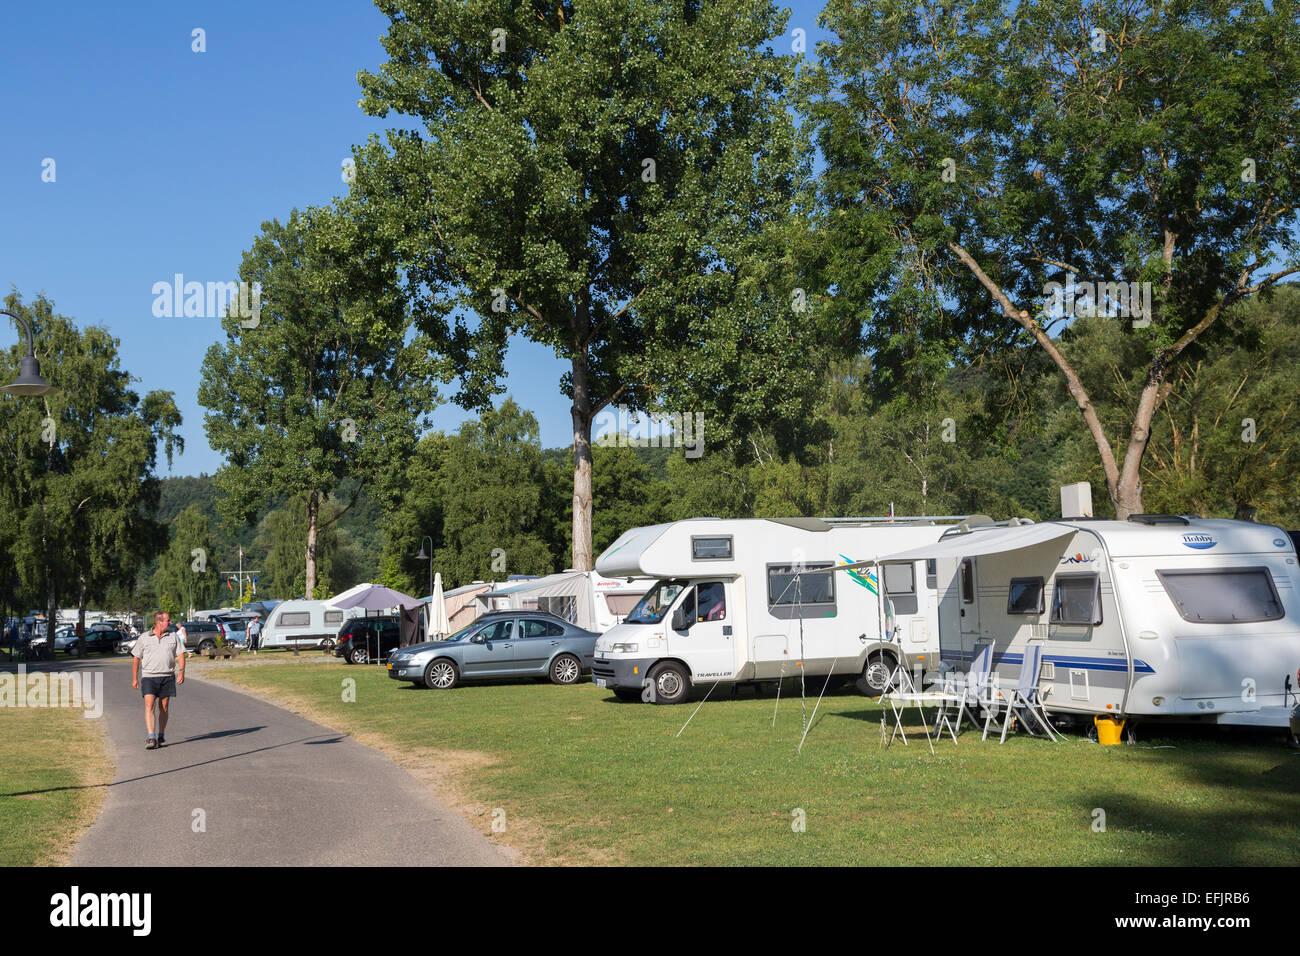 Campsite at Wertheim-Bettingen, Germany - Stock Image